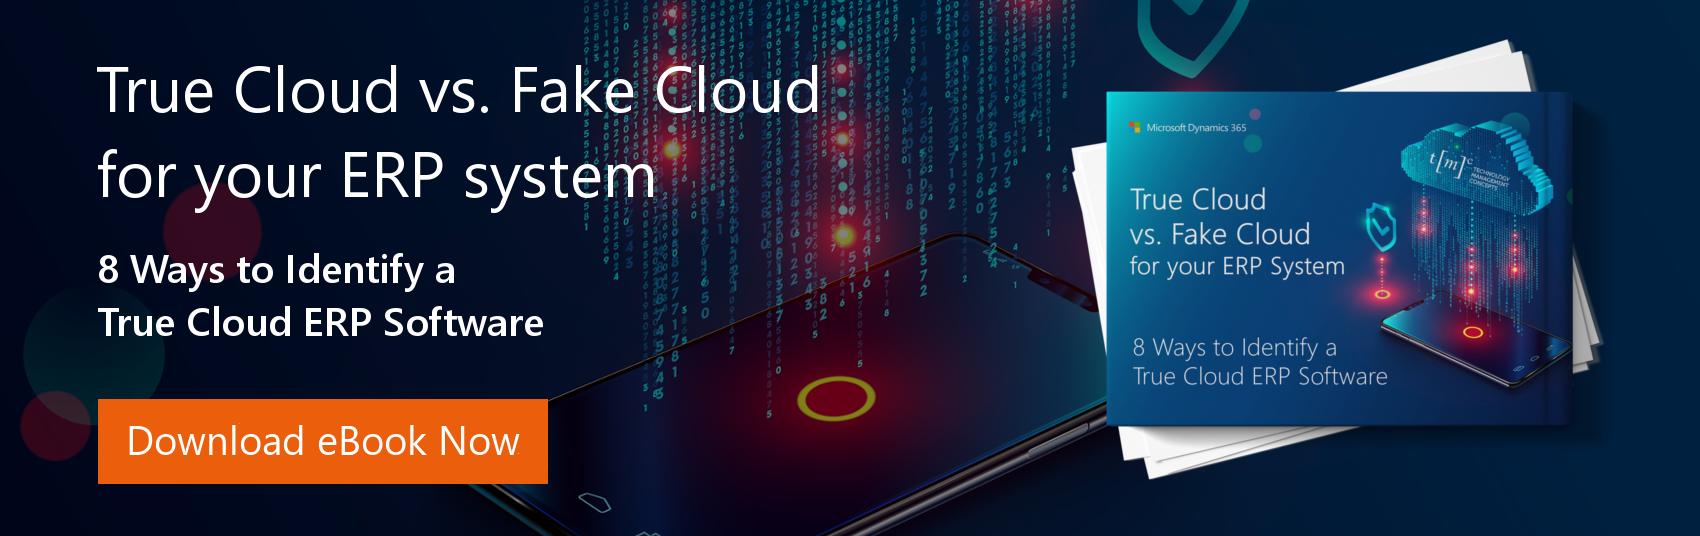 Eight Ways to Identify True Cloud ERP Software